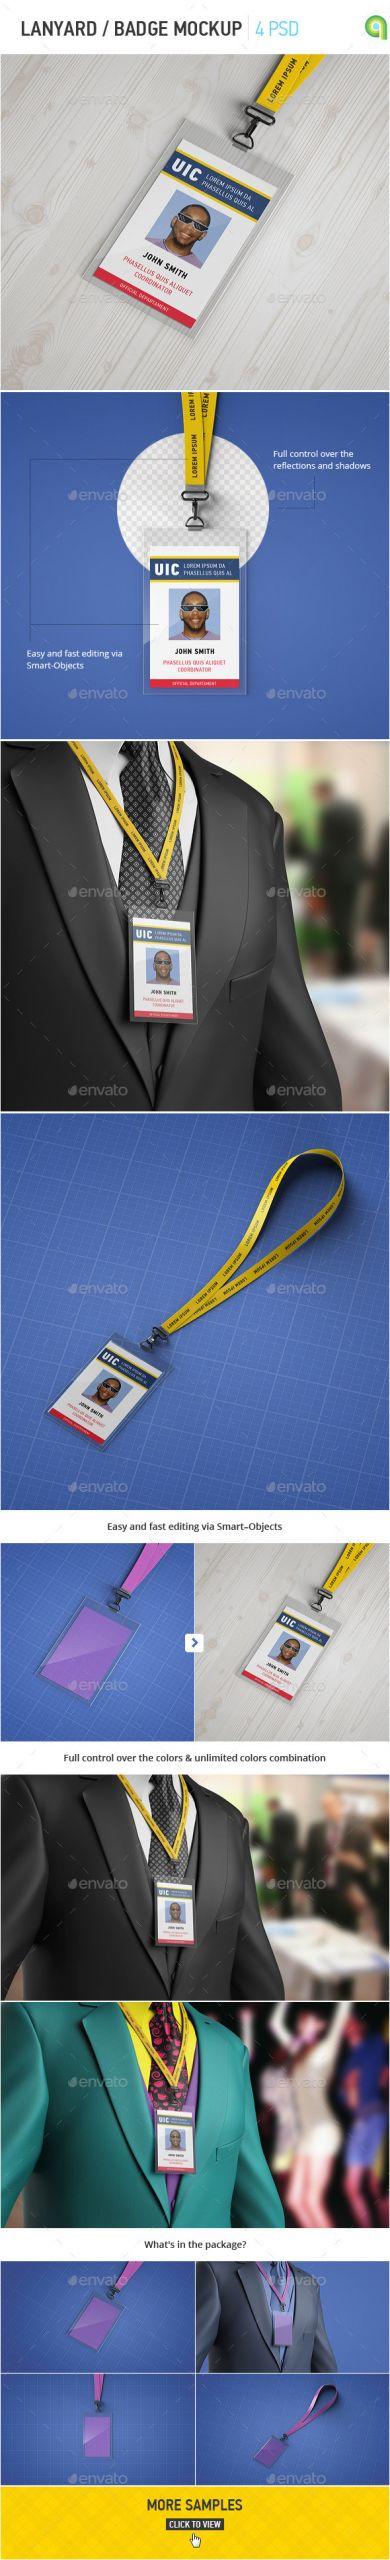 lanyard badge mockup jpg